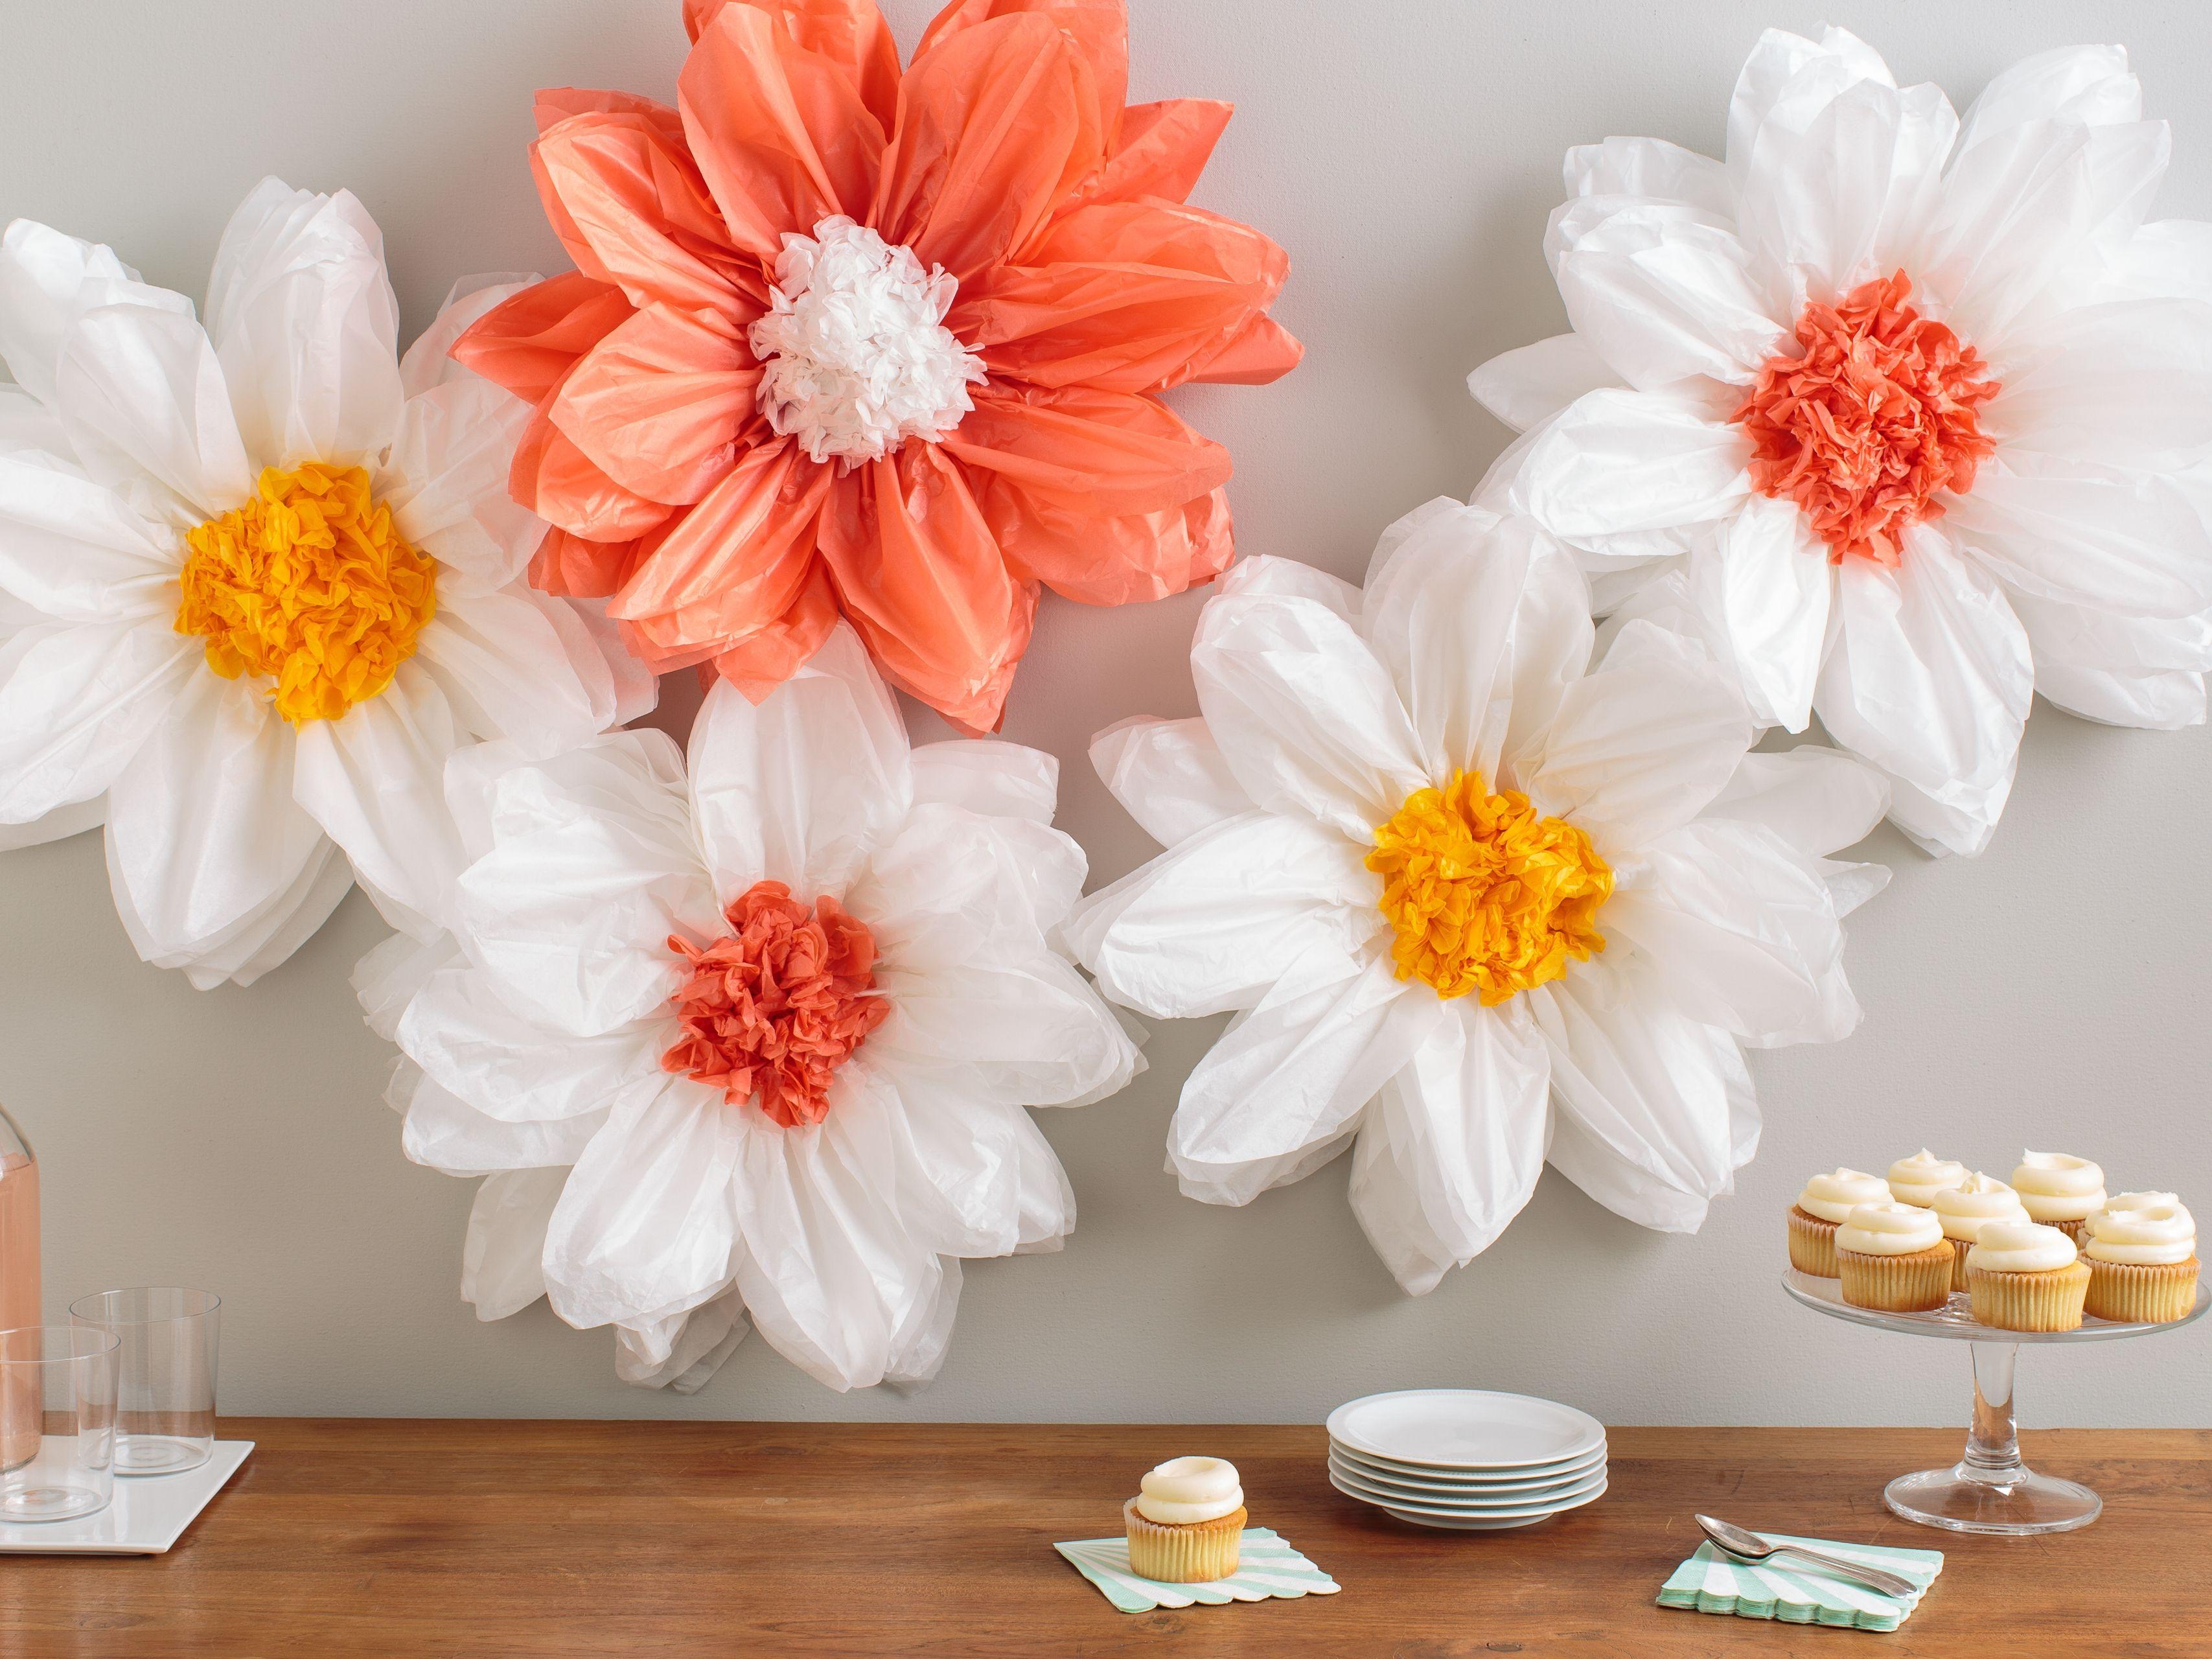 Martha stewart tissue paper pom pom kit daisy light - Martha stewart decoracion ...